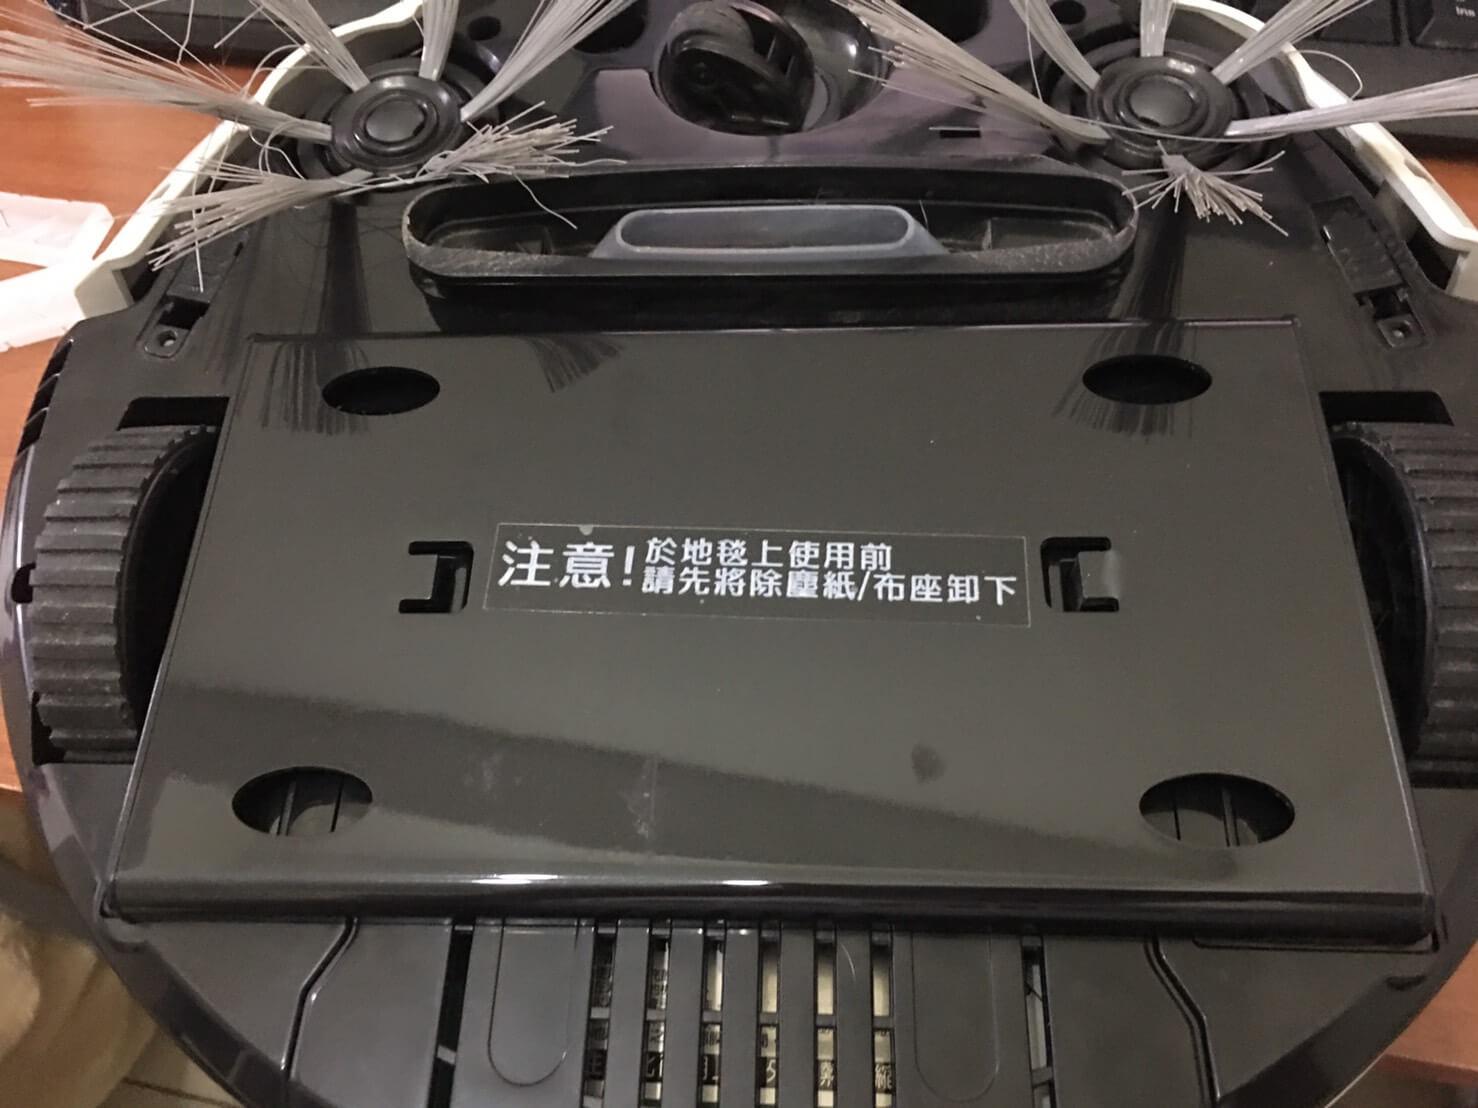 VBOT掃地機器人 塵布蓋